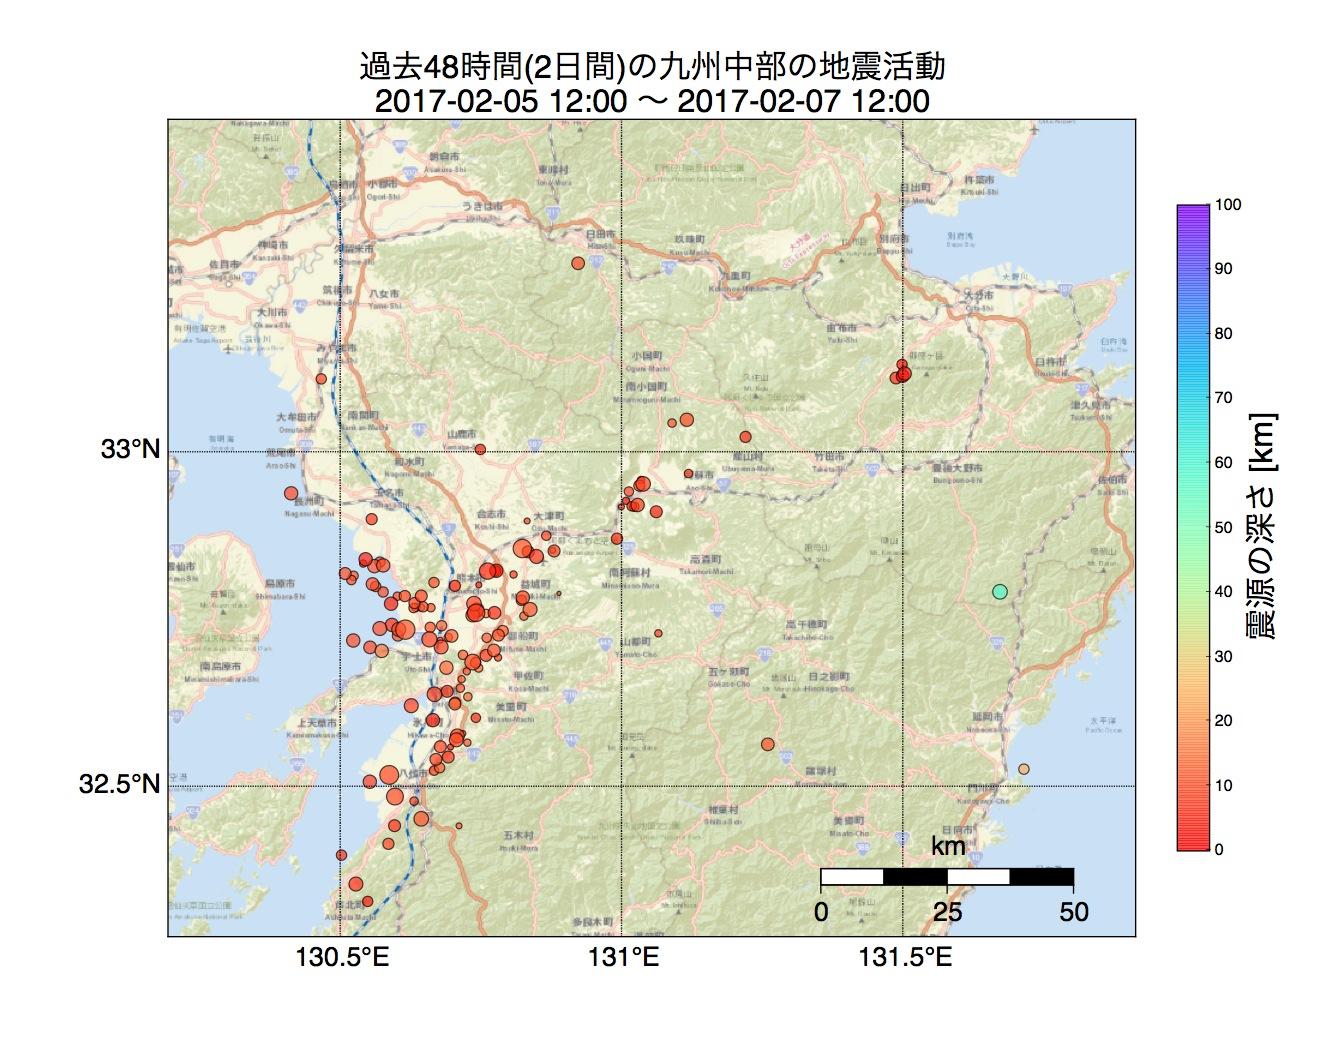 http://jishin.chamu.org/aso/20170207_2.jpg